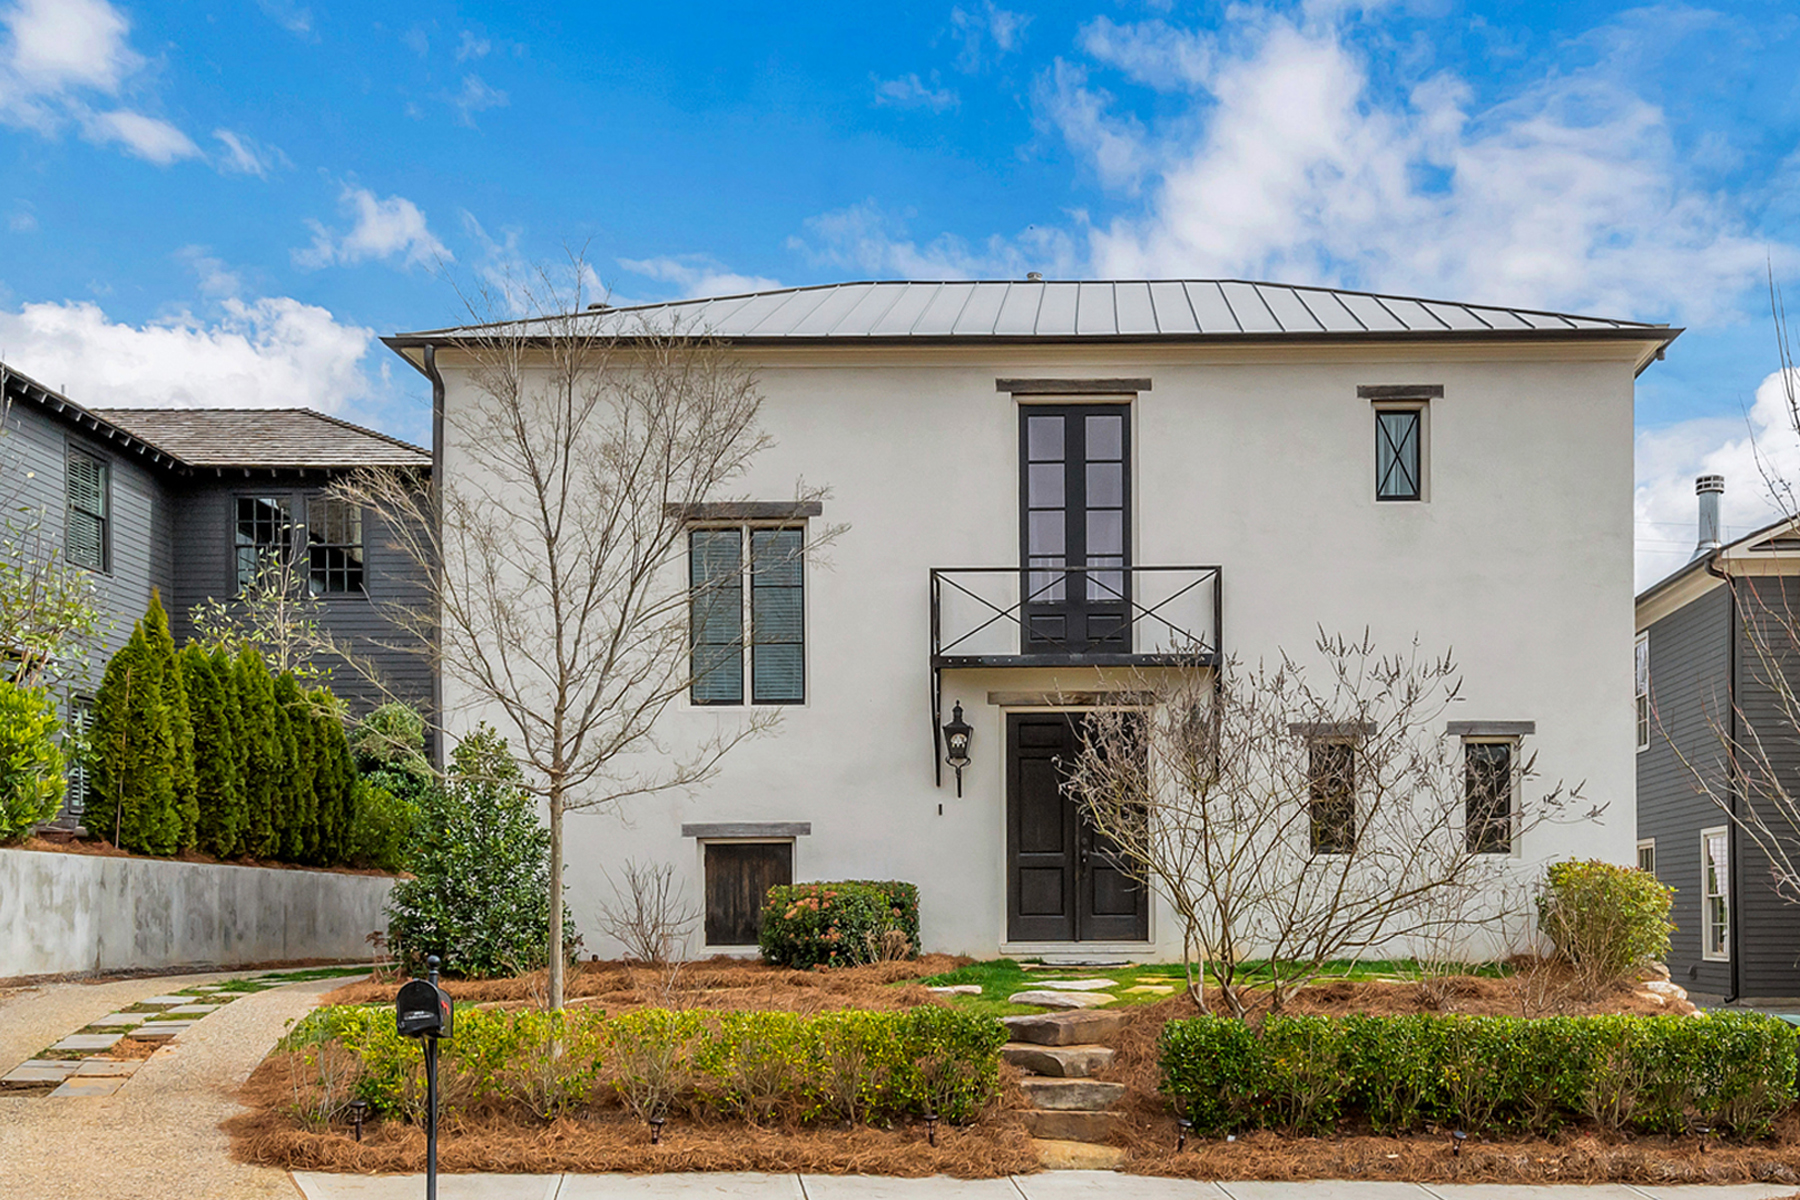 Single Family Homes для того Продажа на Custom European Inspired Home In Vickery 6915 Colfax Avenue, Cumming, Джорджия 30040 Соединенные Штаты